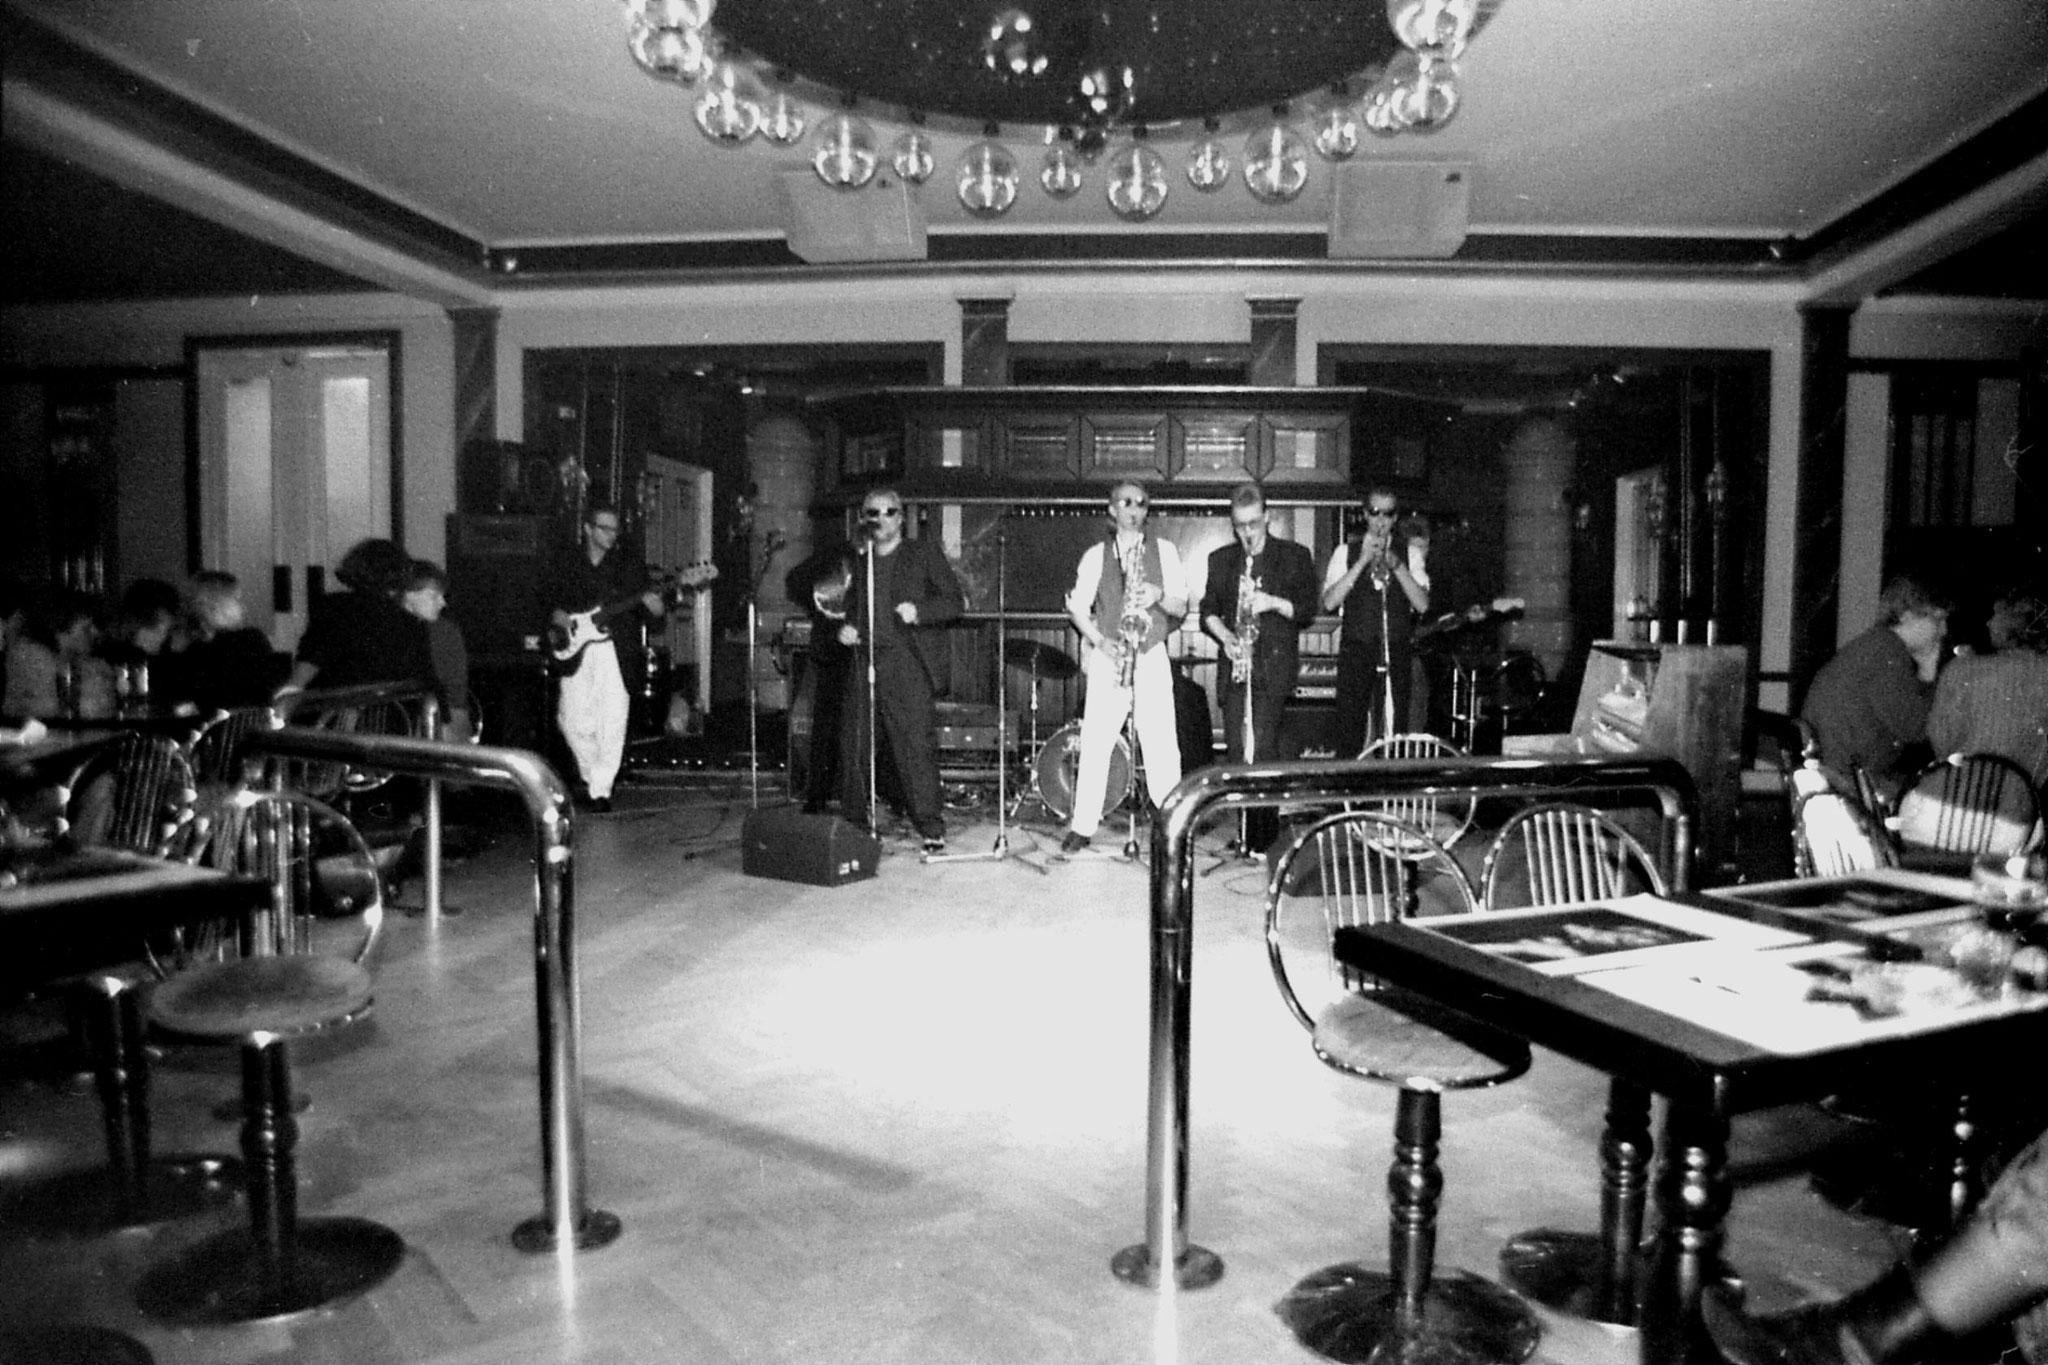 11/10/1988: 1: band at Helsinki Univ. Music Depart. party